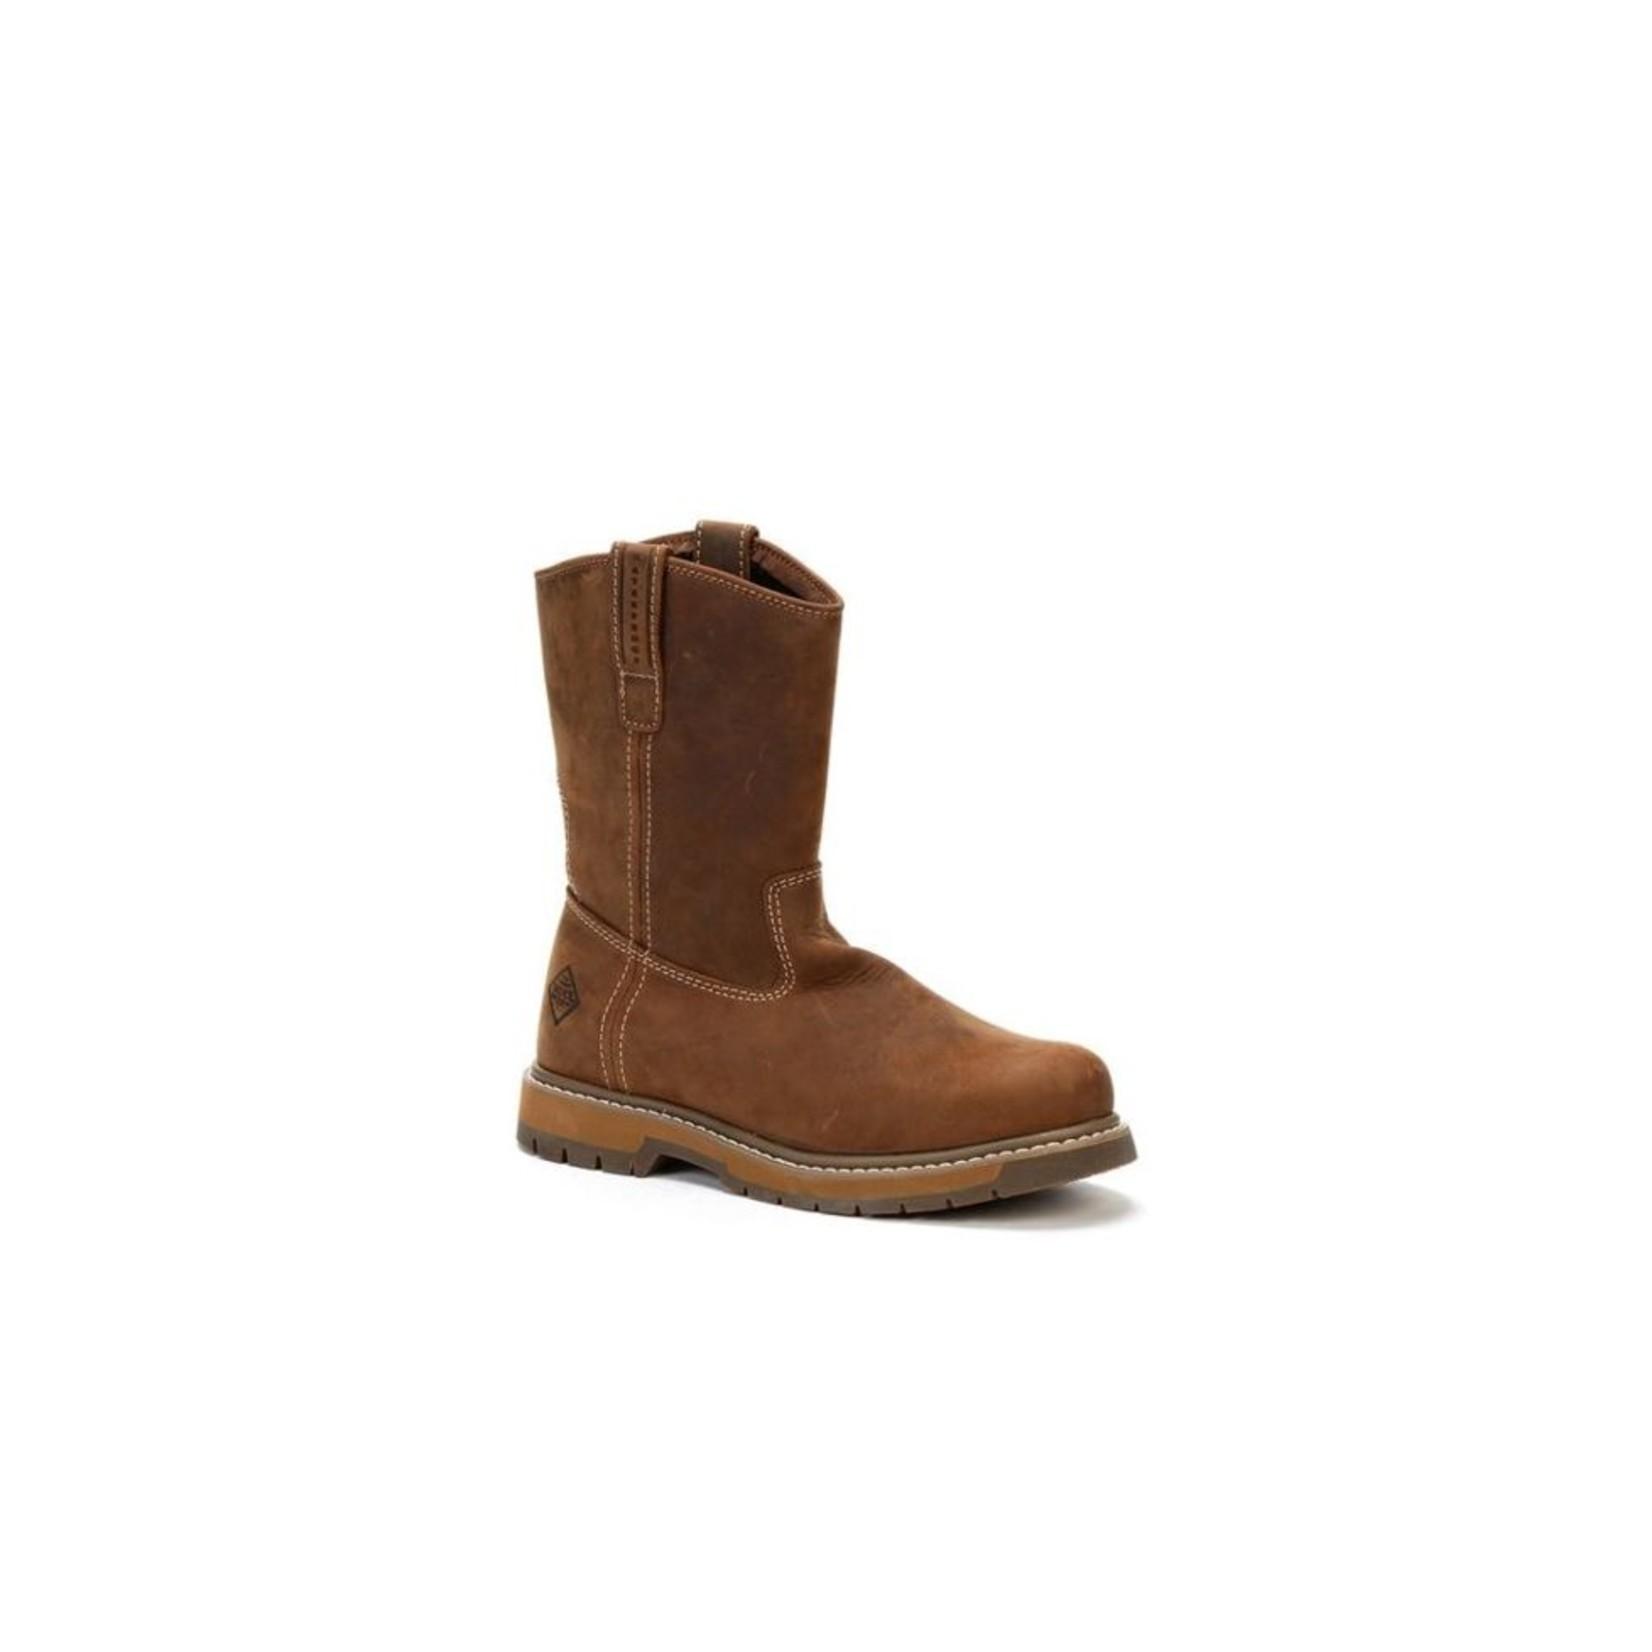 Muck Work Boot LTH-904W